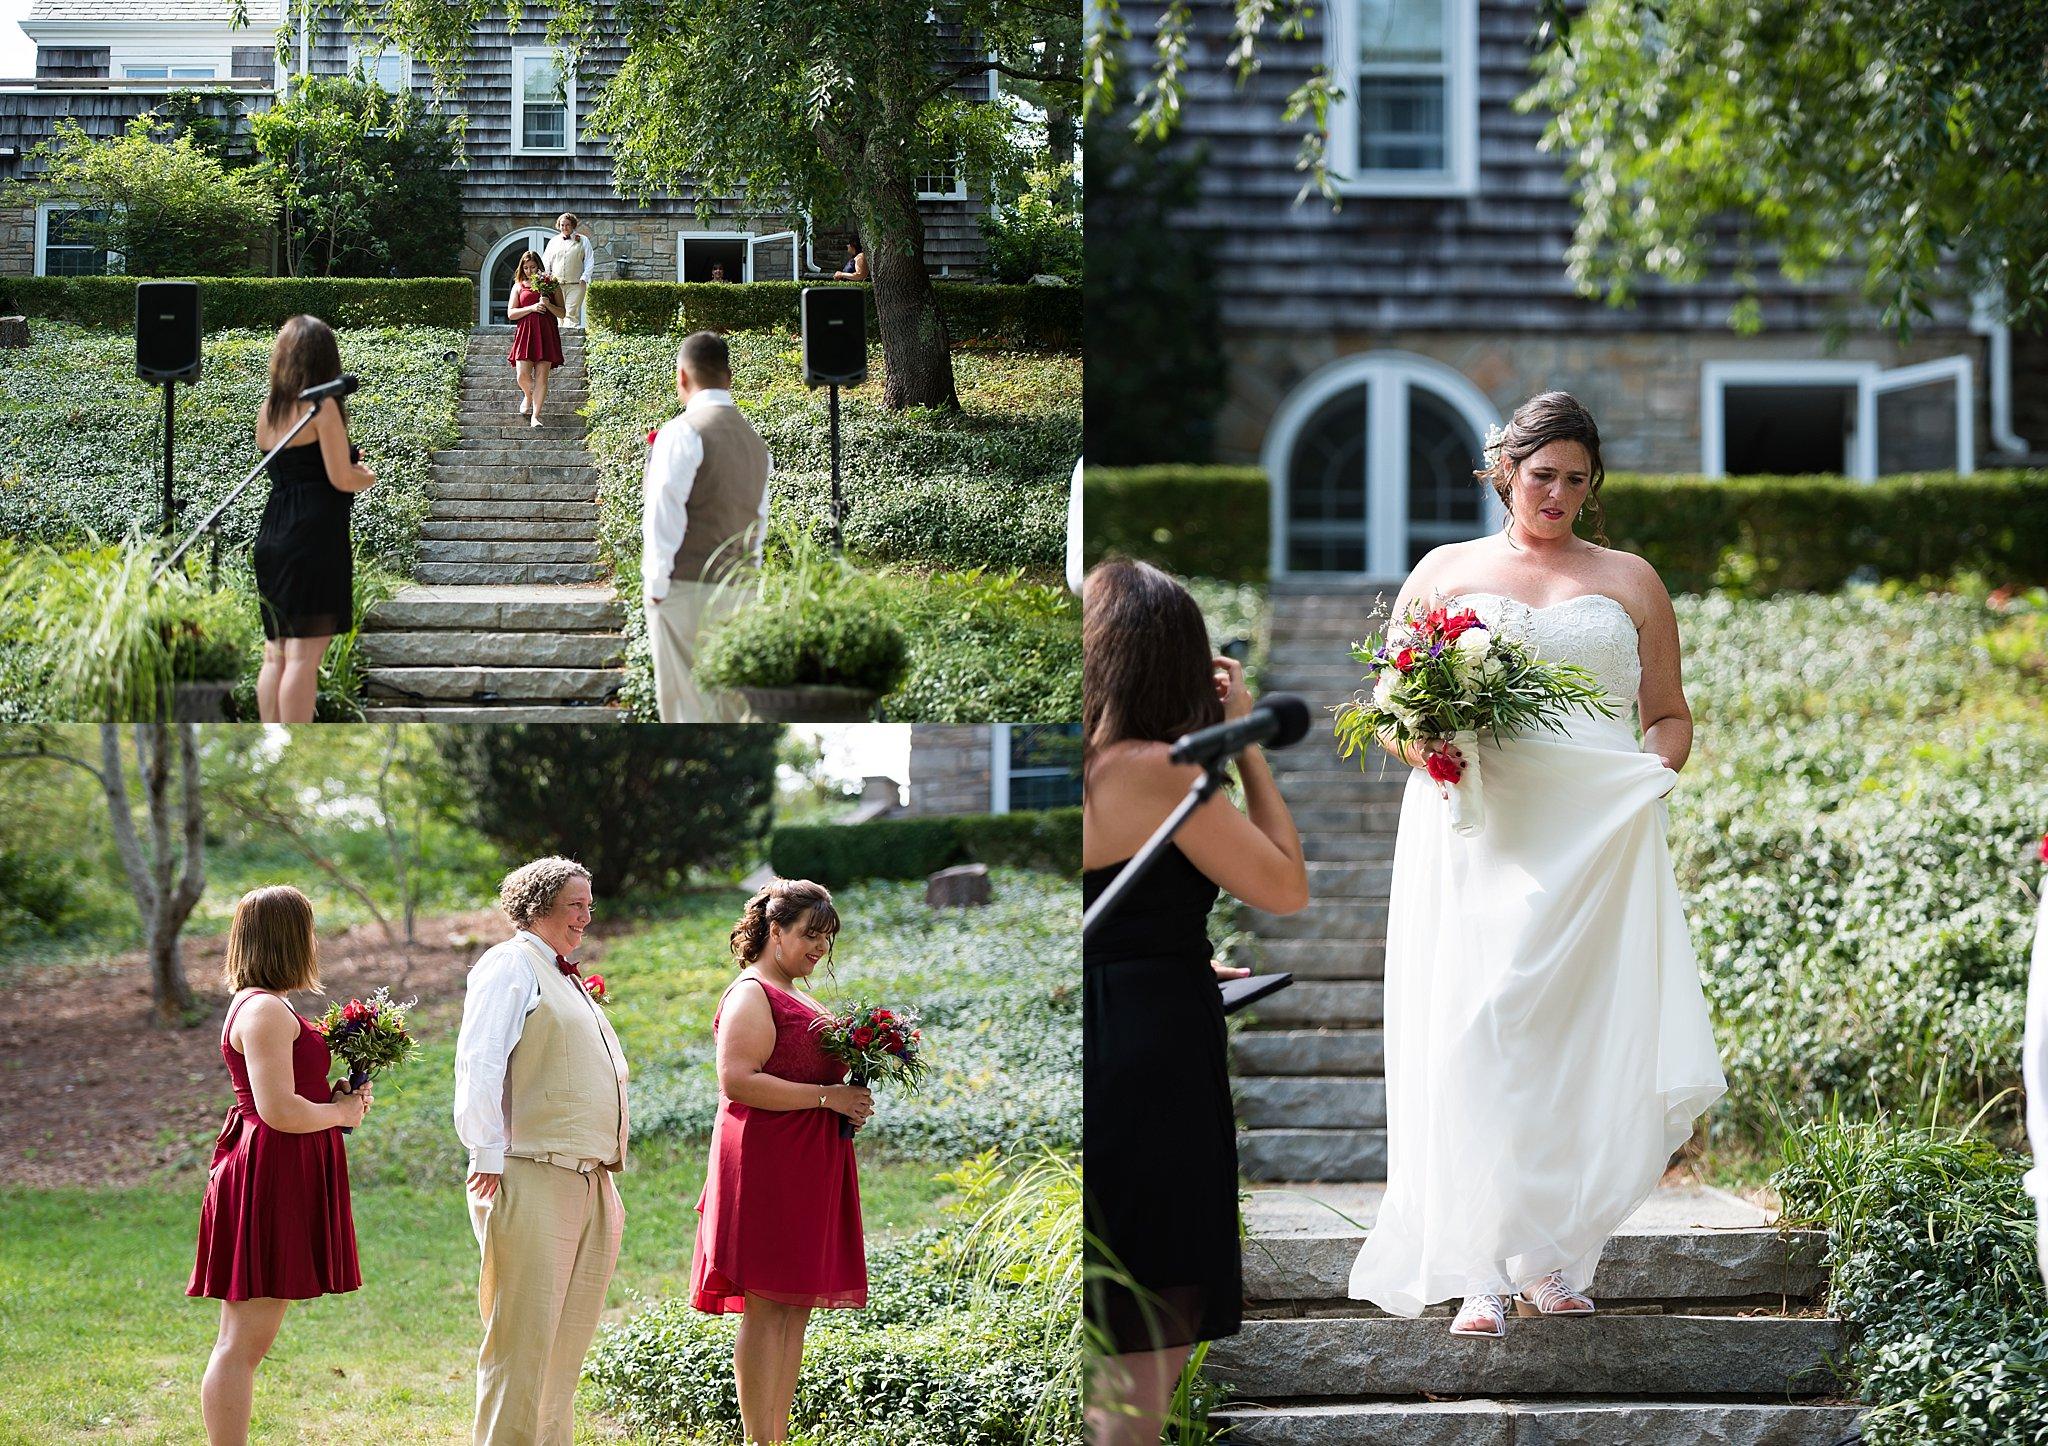 rustic wedding locations in new england.jpg